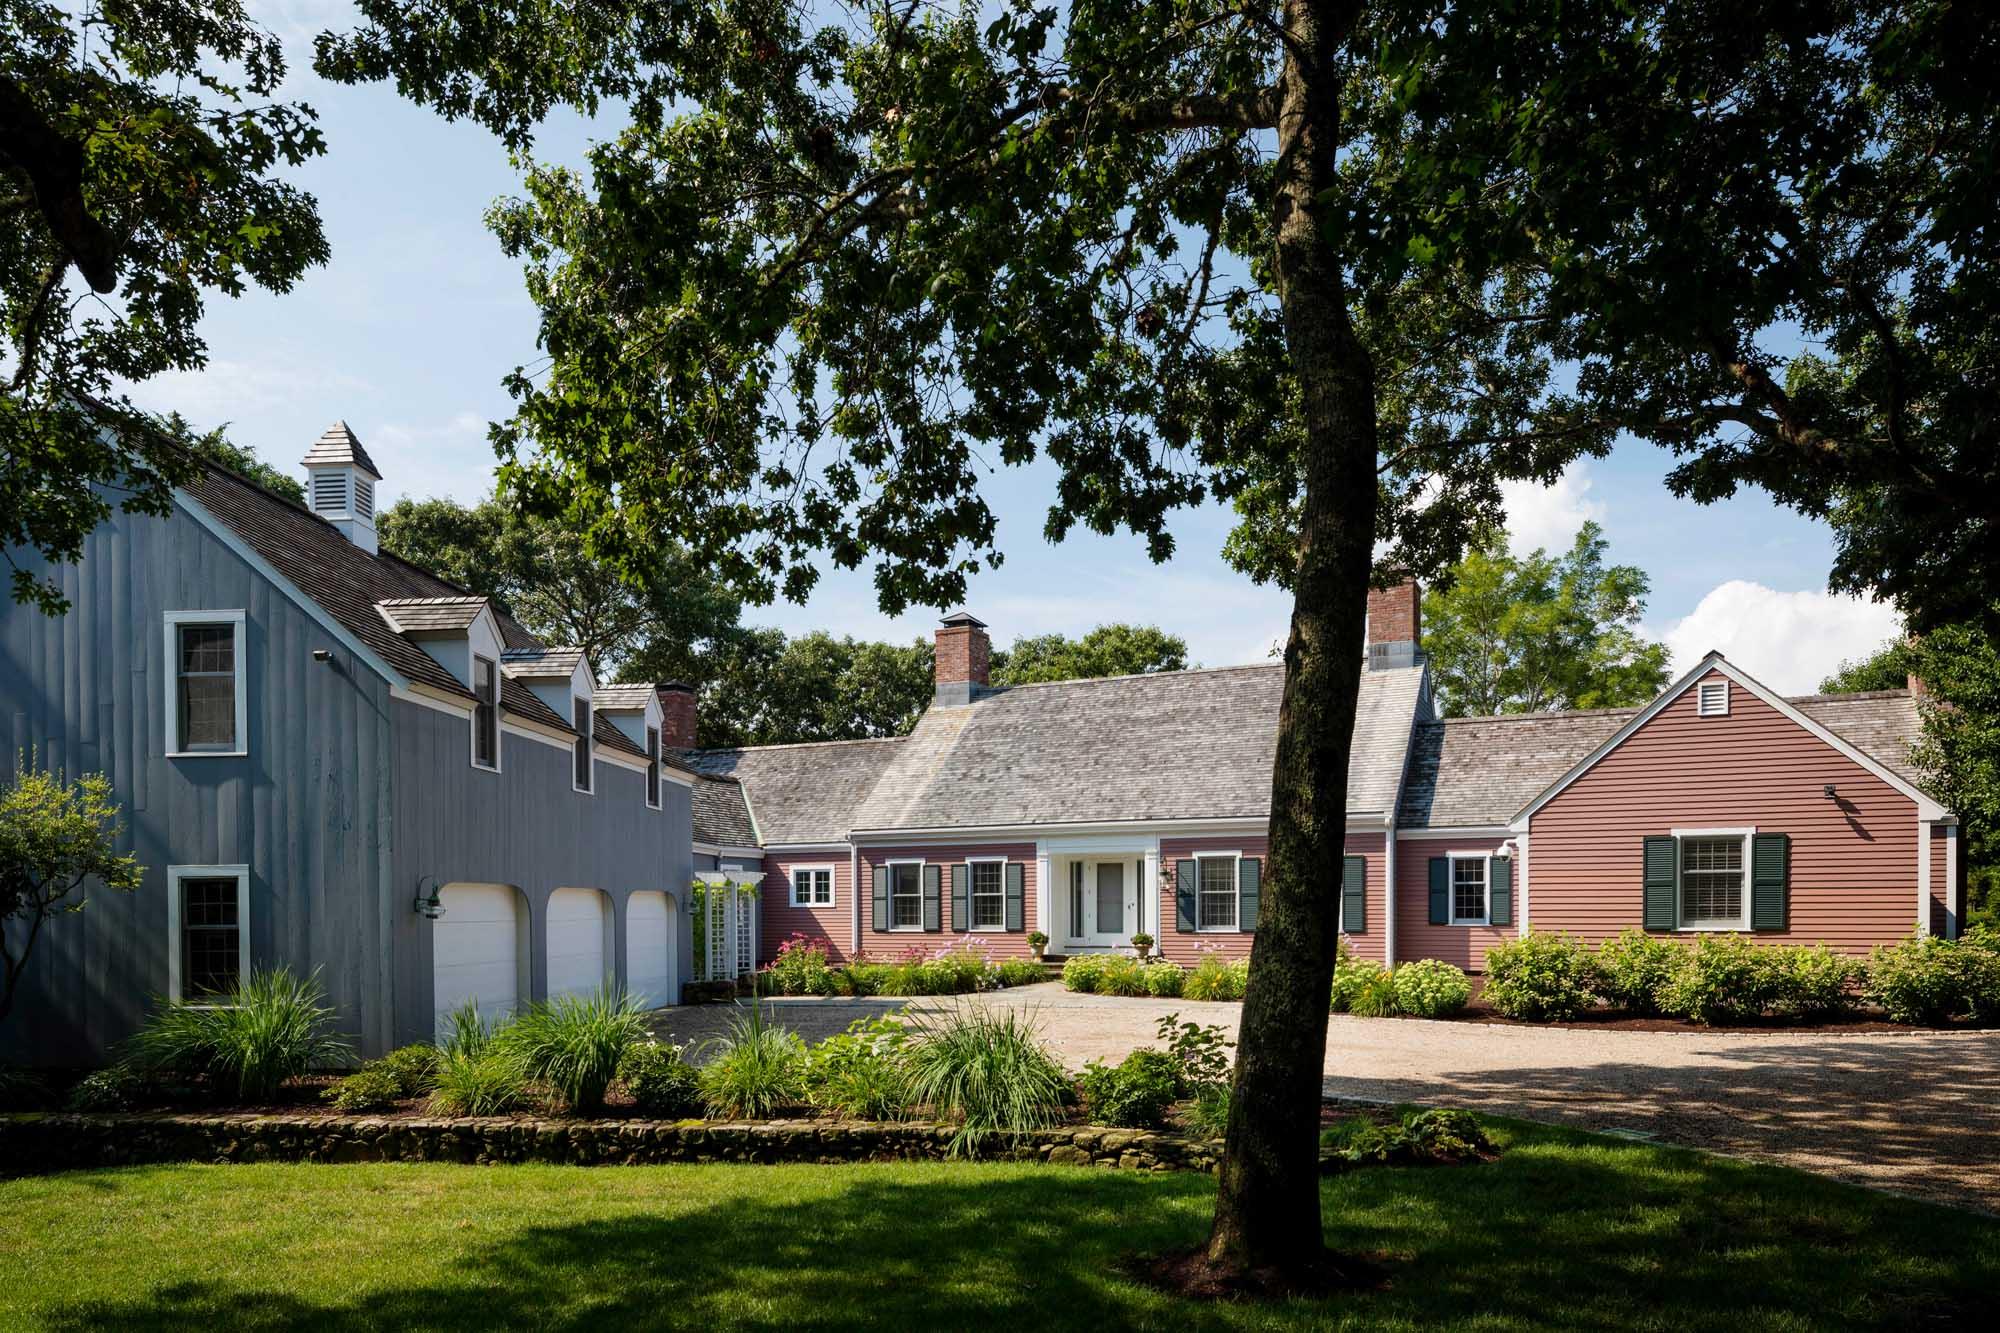 Boston ranch style house design by Dane Austin Design